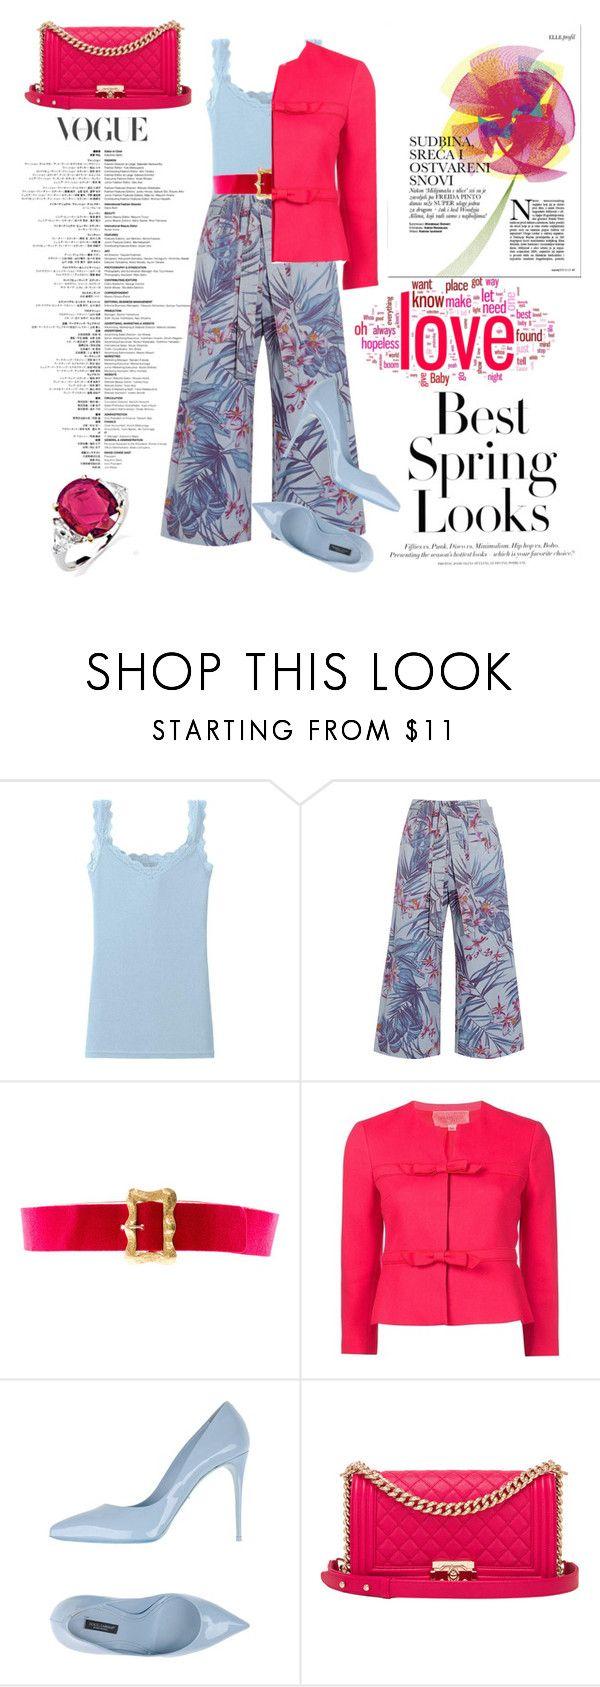 """pinkkk"" by e-memagic ❤ liked on Polyvore featuring H&M, Uniqlo, SUNO New York, Chanel, Giambattista Valli and Dolce&Gabbana"